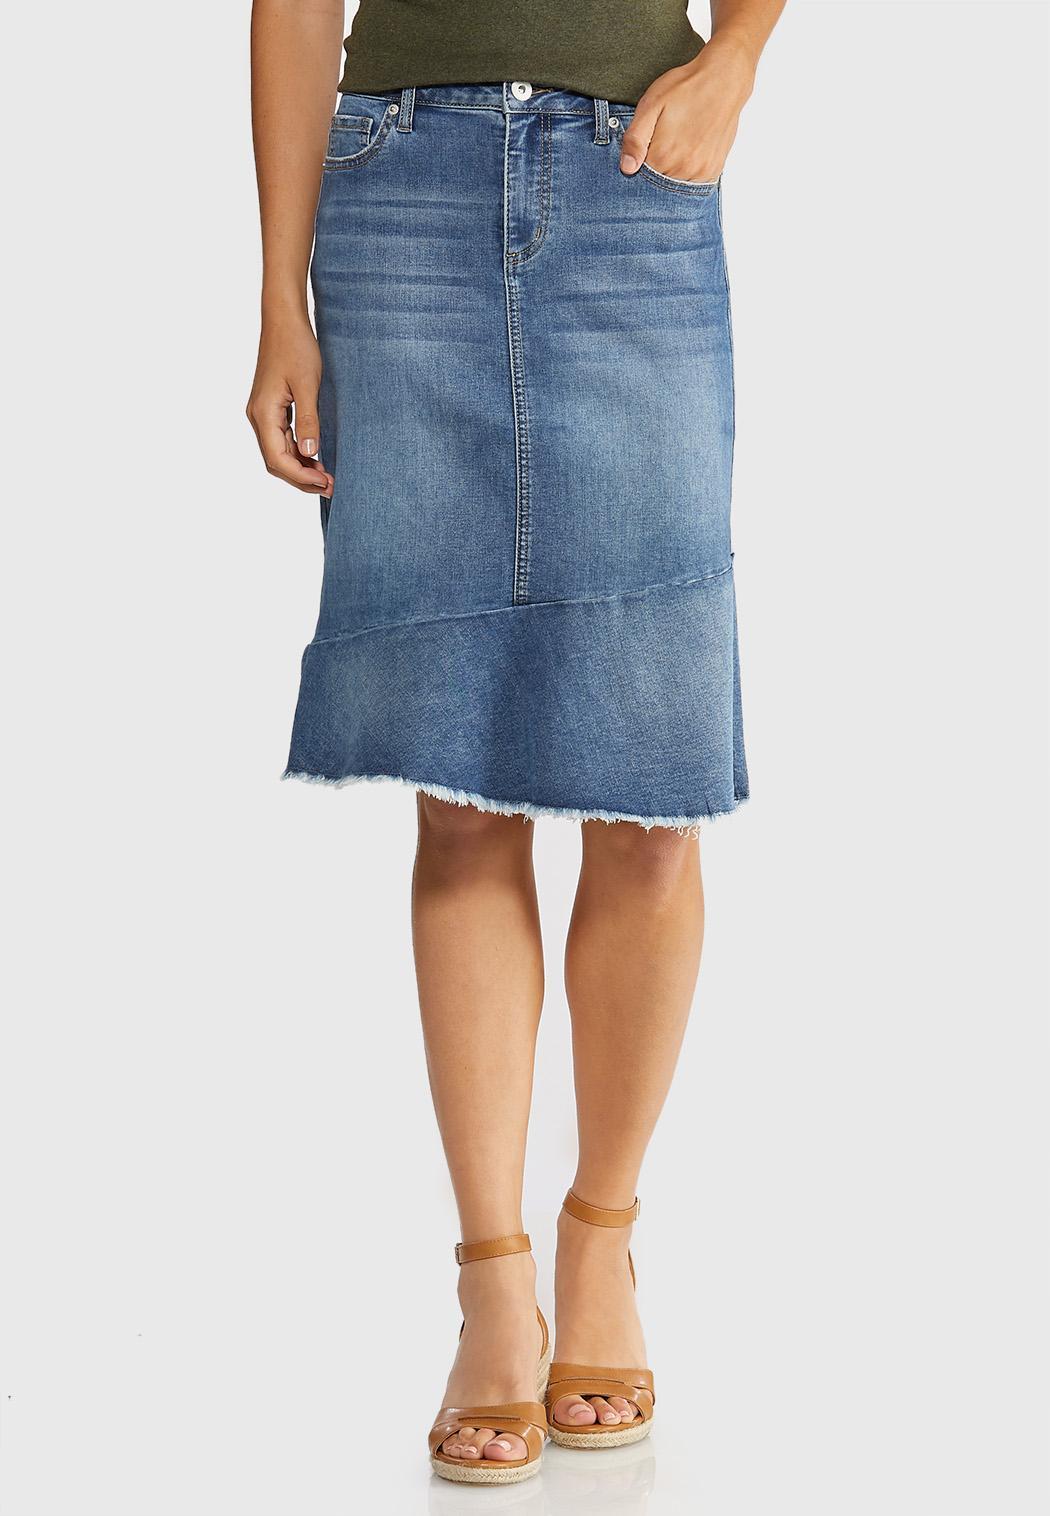 99589ce7e Plus Size Fringed Denim Skirt Skirts Cato Fashions